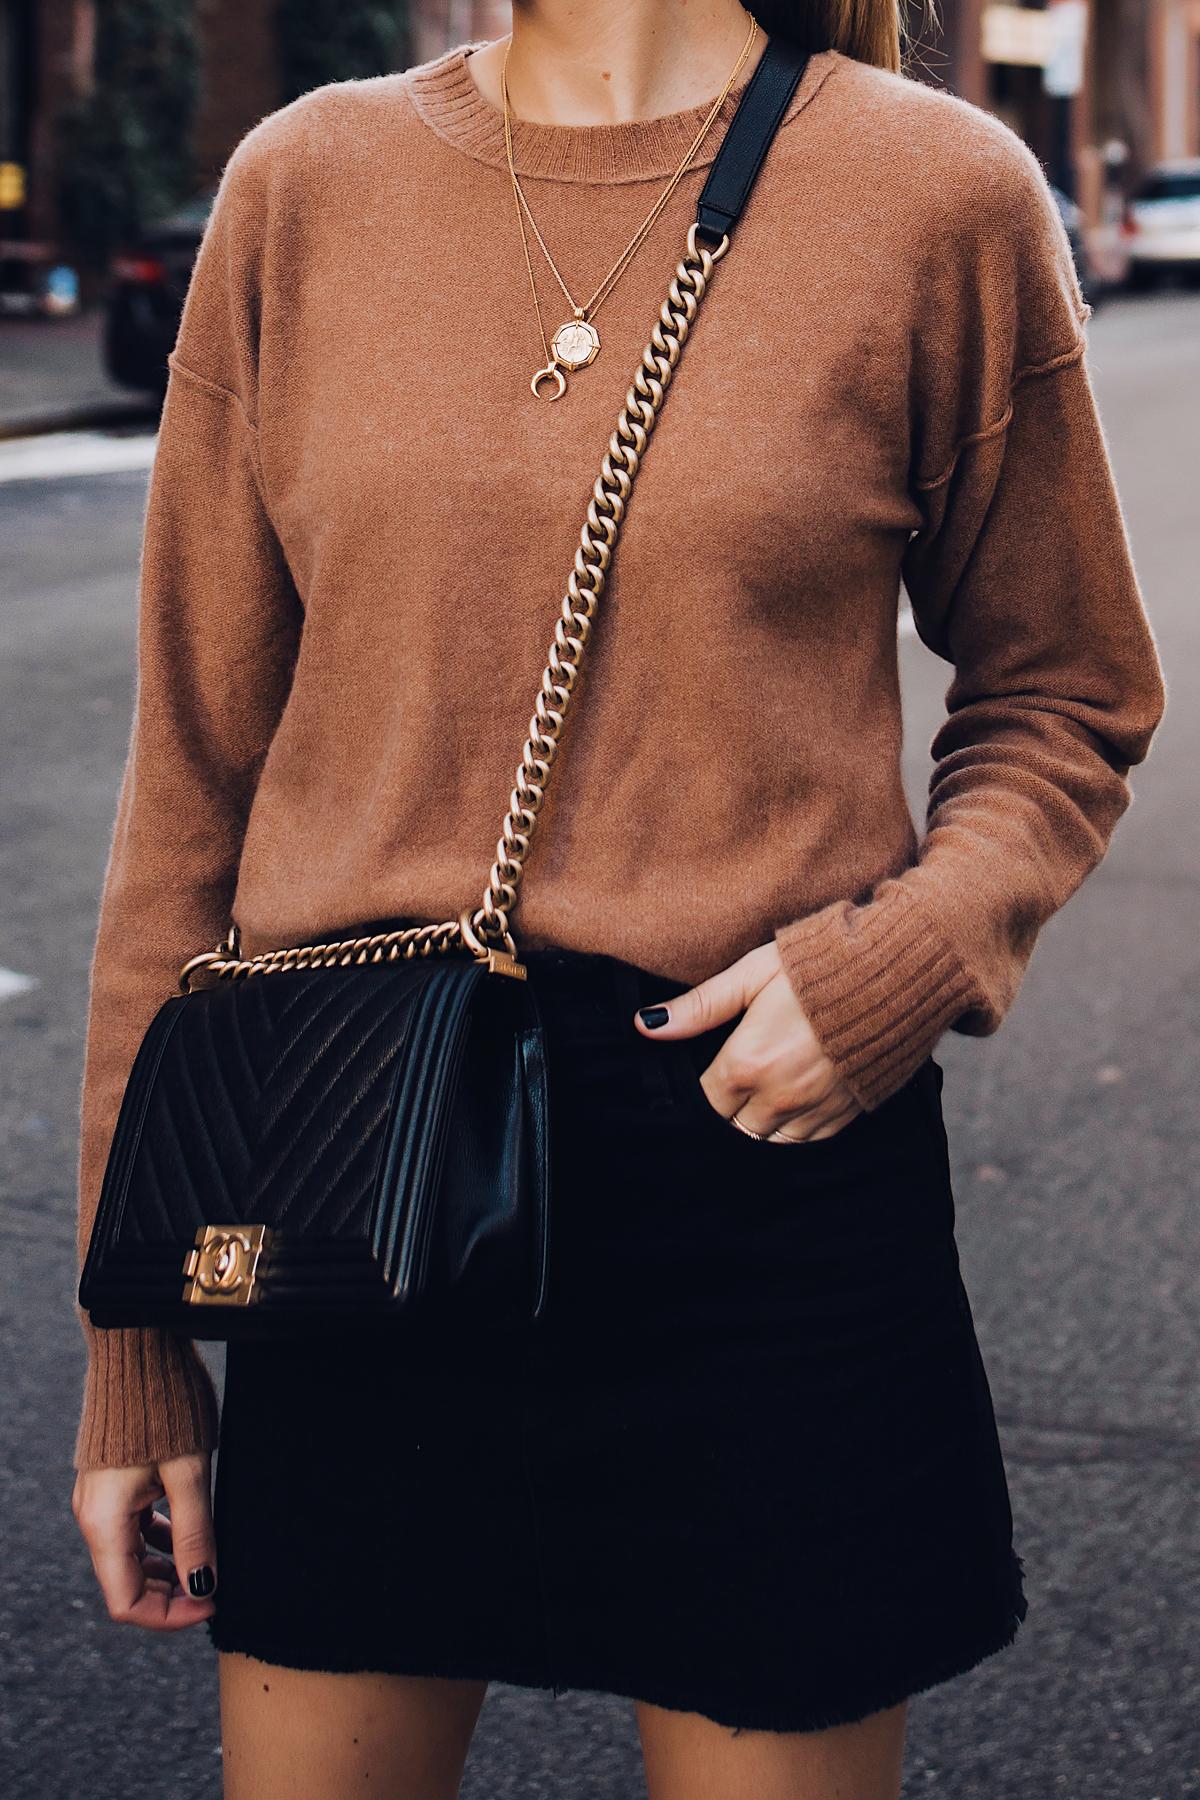 Woman Wearing Free People Tan Sweater Black Denim Skirt Chanel Black Boy Bag Fashion Jackson San Diego Fashion Blogger Street Style